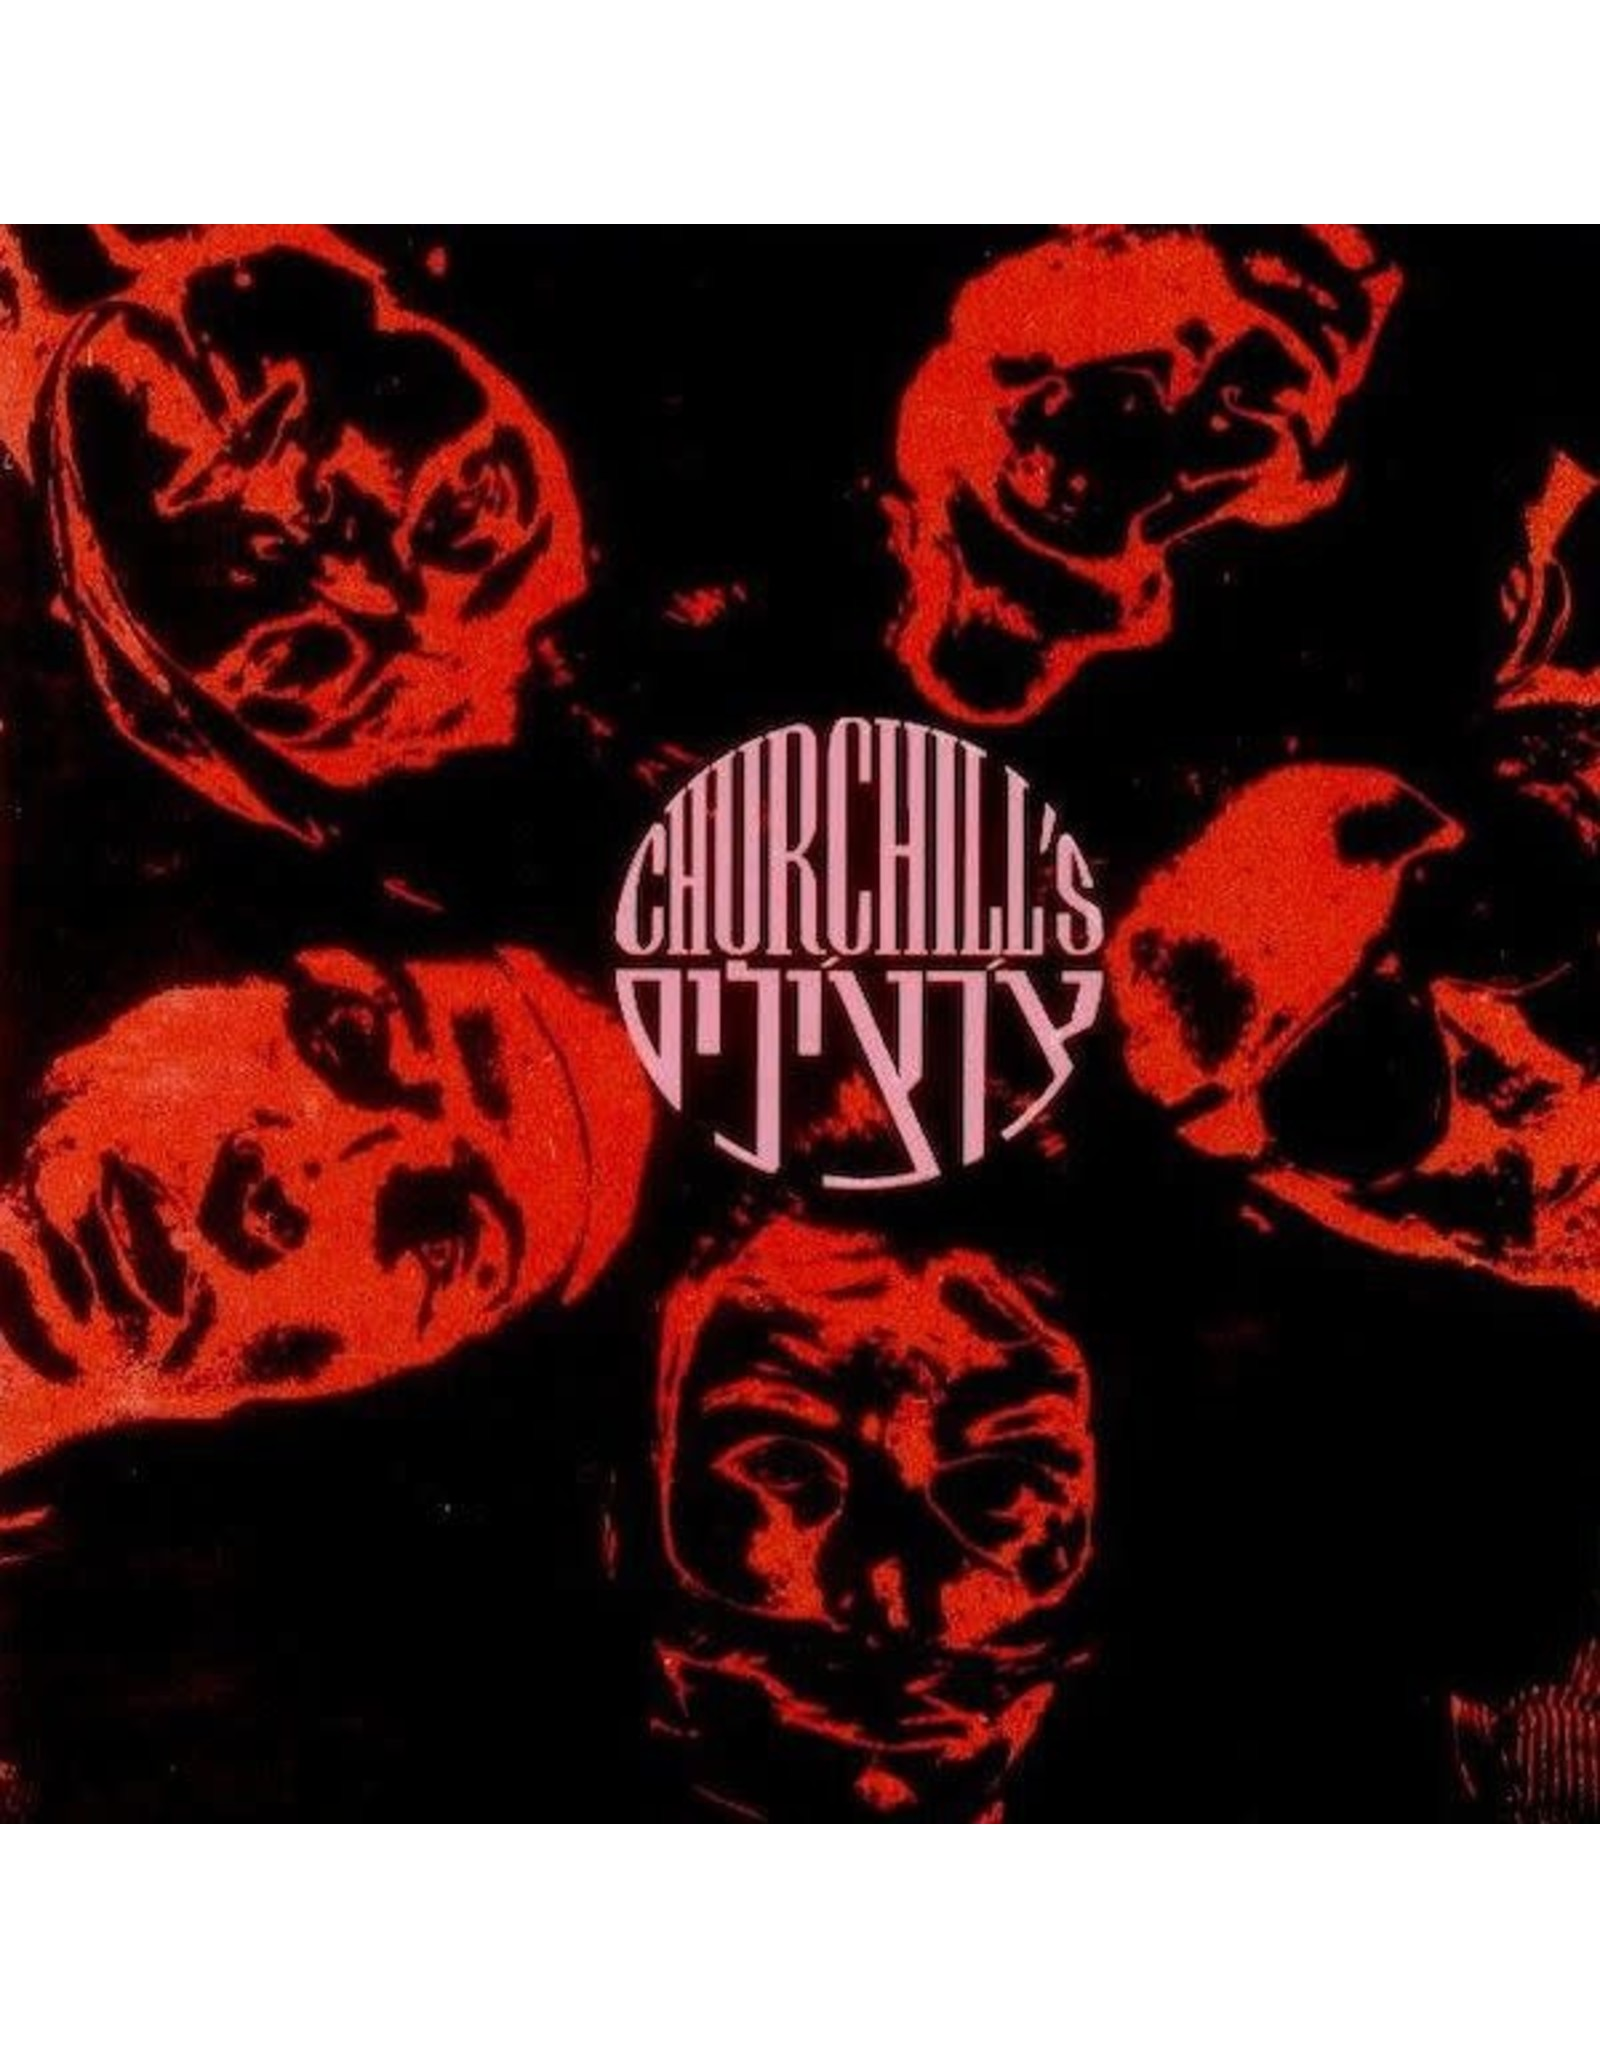 Vinyl The Churchills - S/T